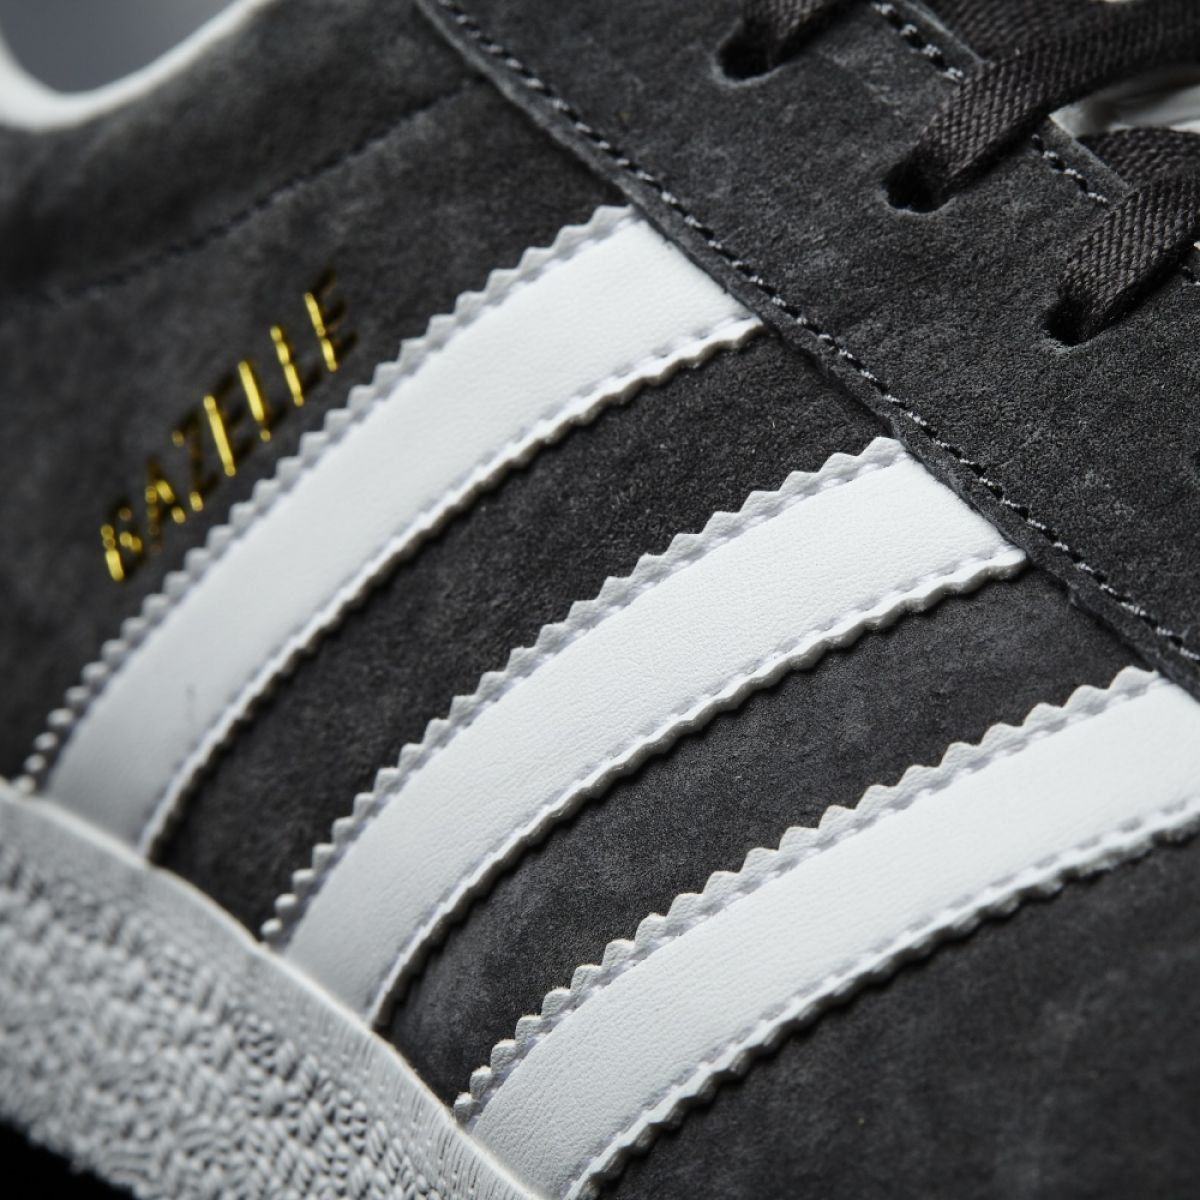 Buty Adidas Originals Gazelle M Bb5480 Szare Adidas Originals Logo Adidas Originals Sports Shoes Adidas